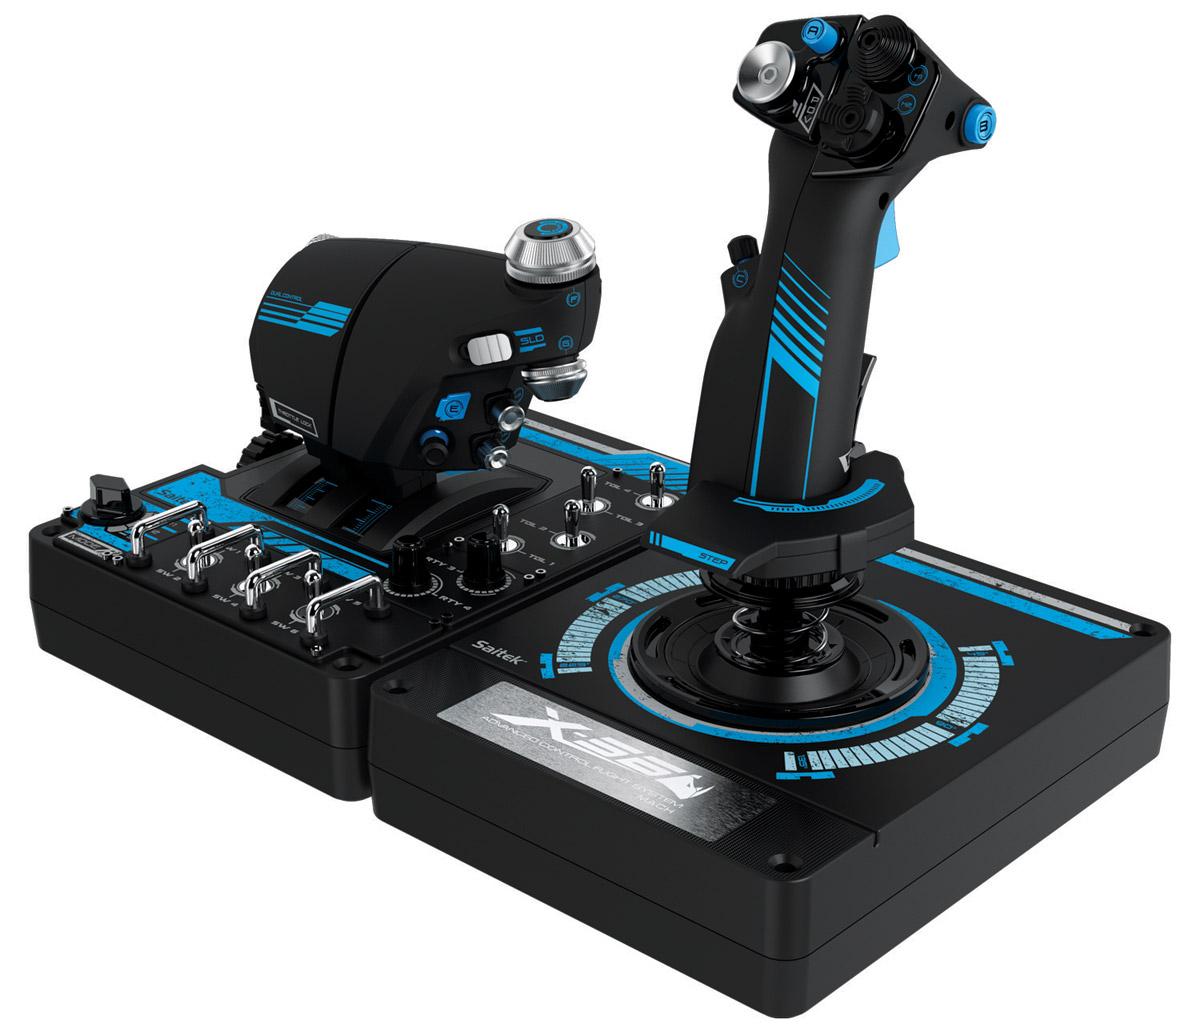 Saitek X56 Rhino H.O.T.A.S. Pro Flight System джойстик для PC (SCB432210002/01/1)